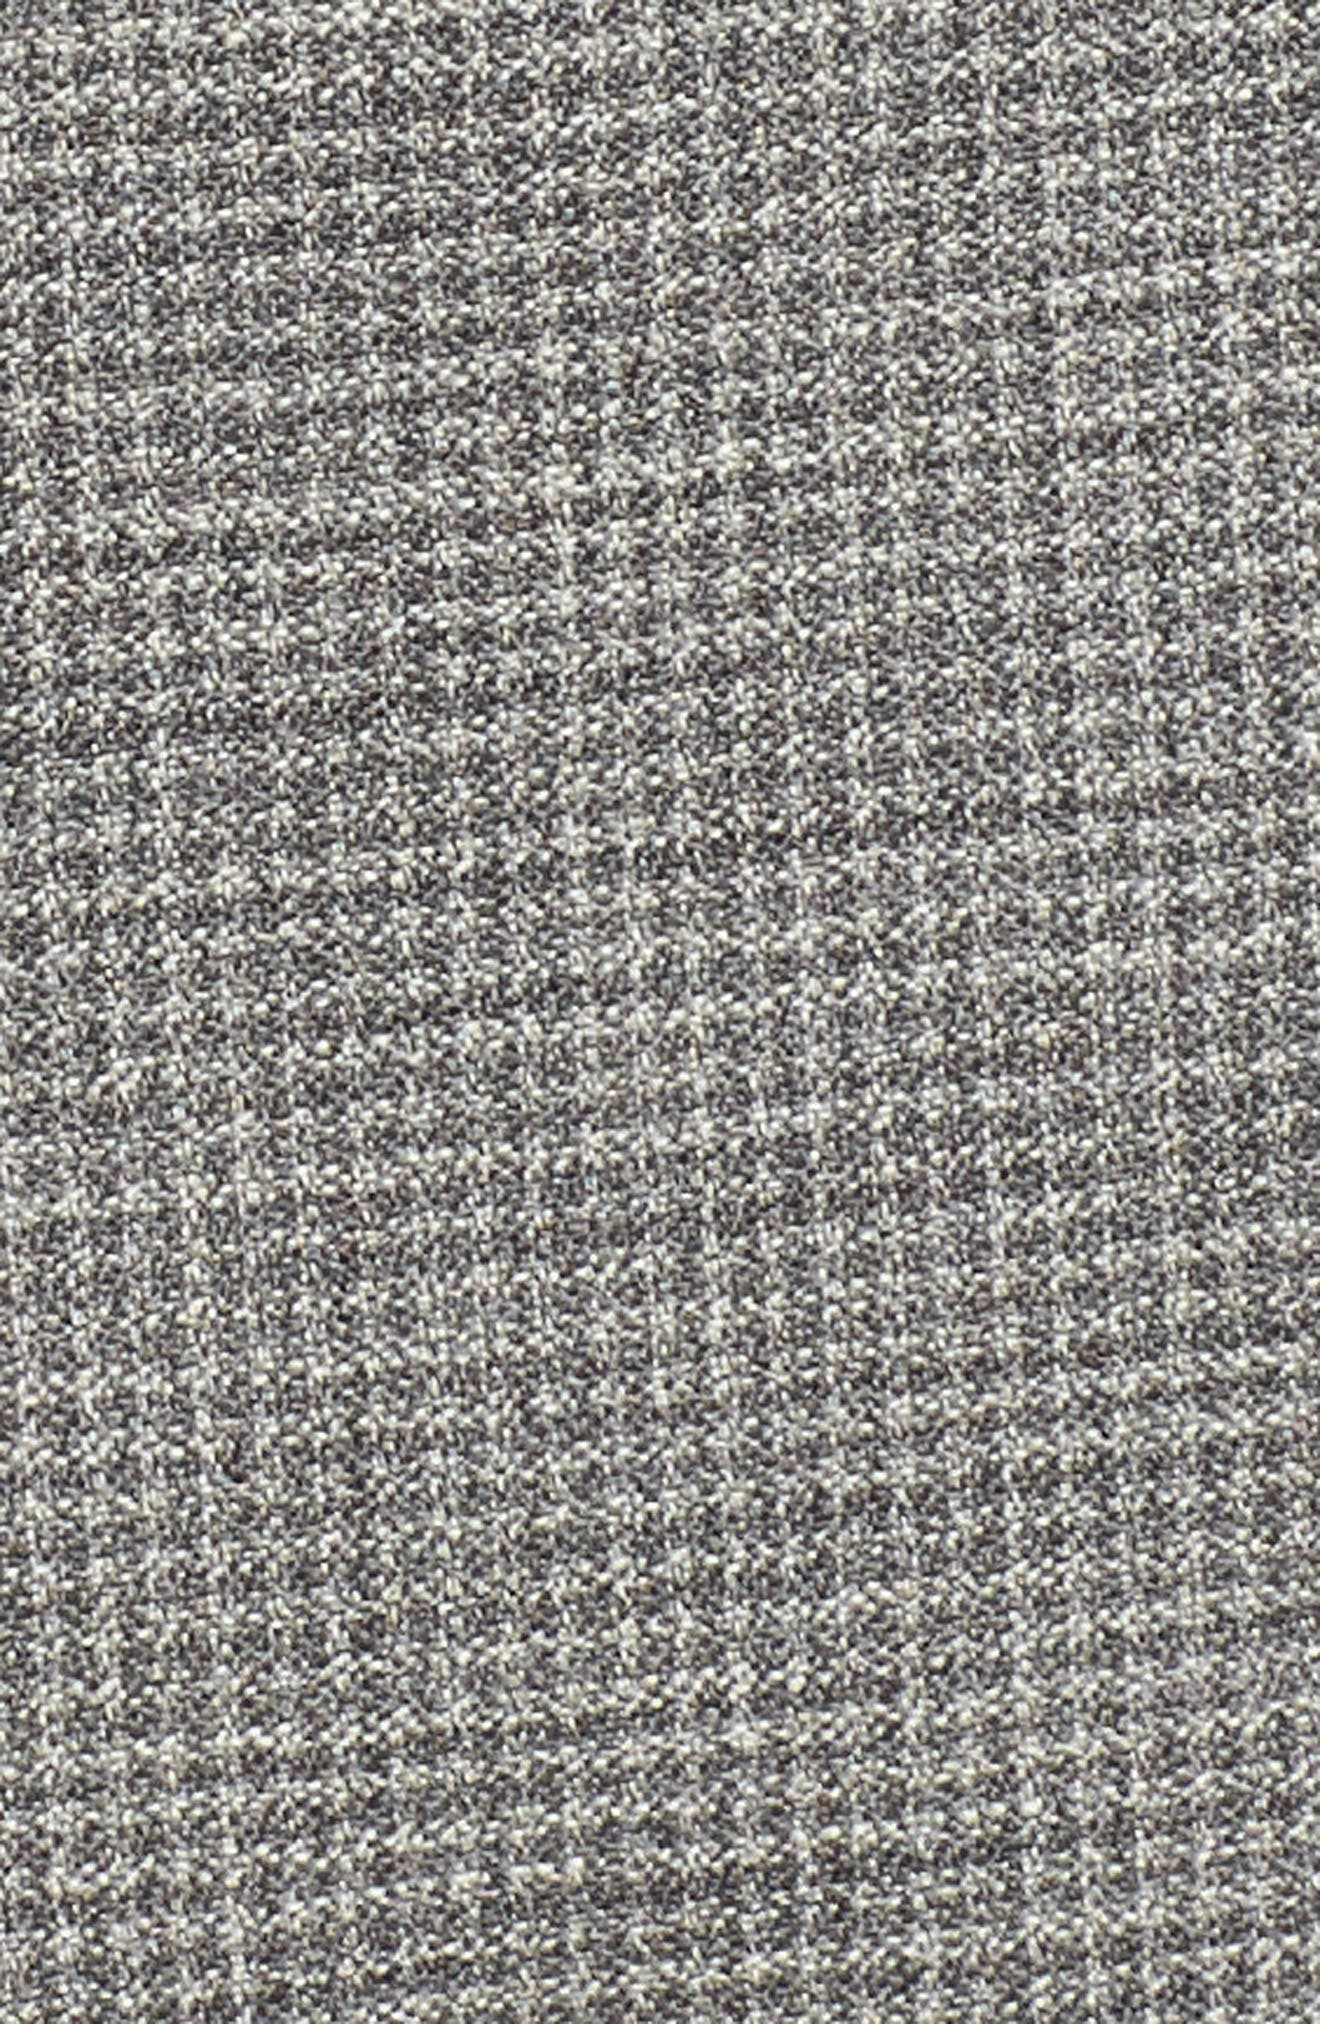 Jewisa Check Wool Jacket,                             Alternate thumbnail 6, color,                             Cozy Grey Fantasy